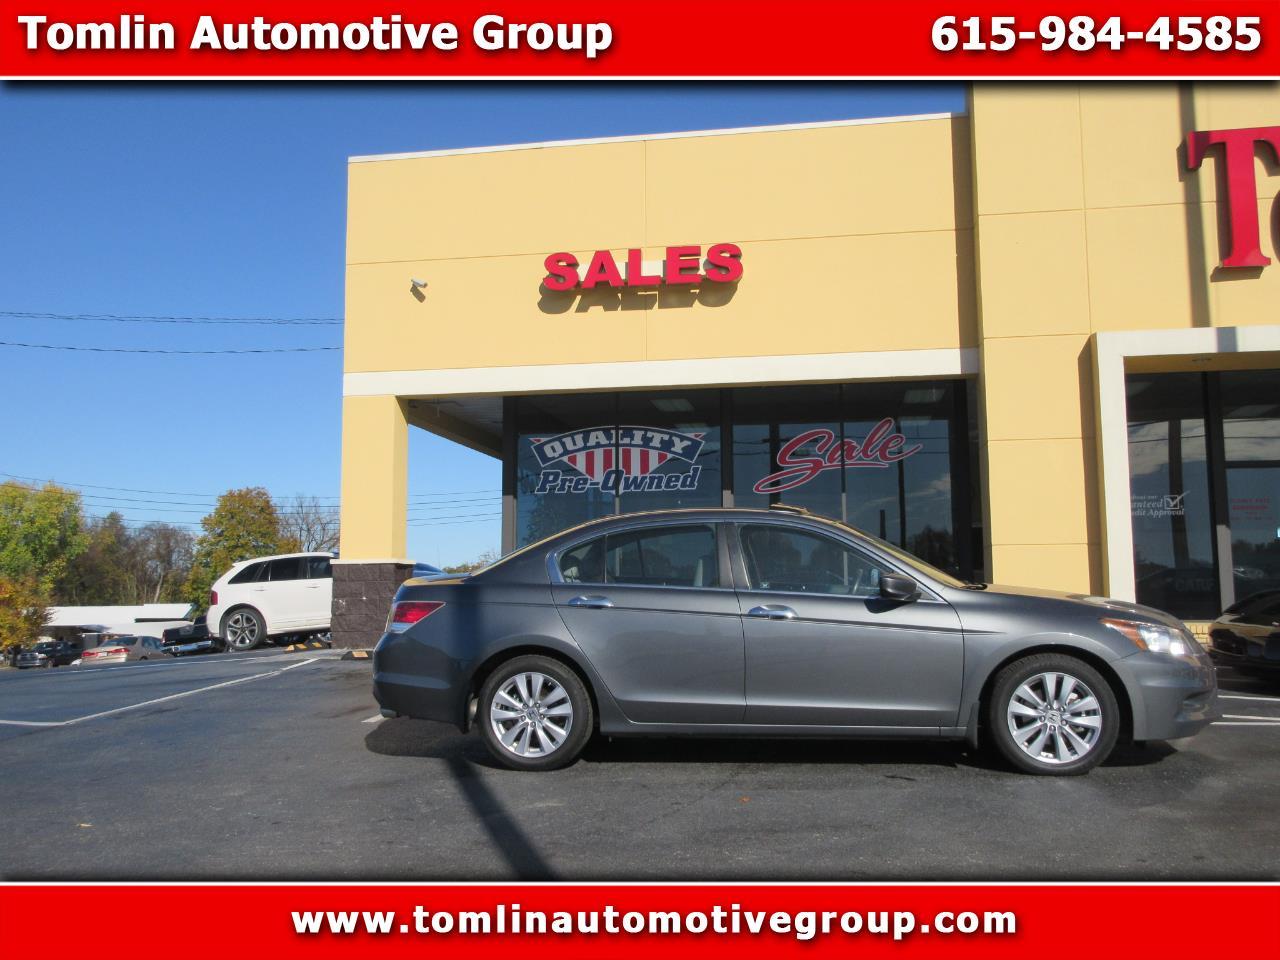 2011 Honda Accord Sdn 4dr V6 Auto EX-L